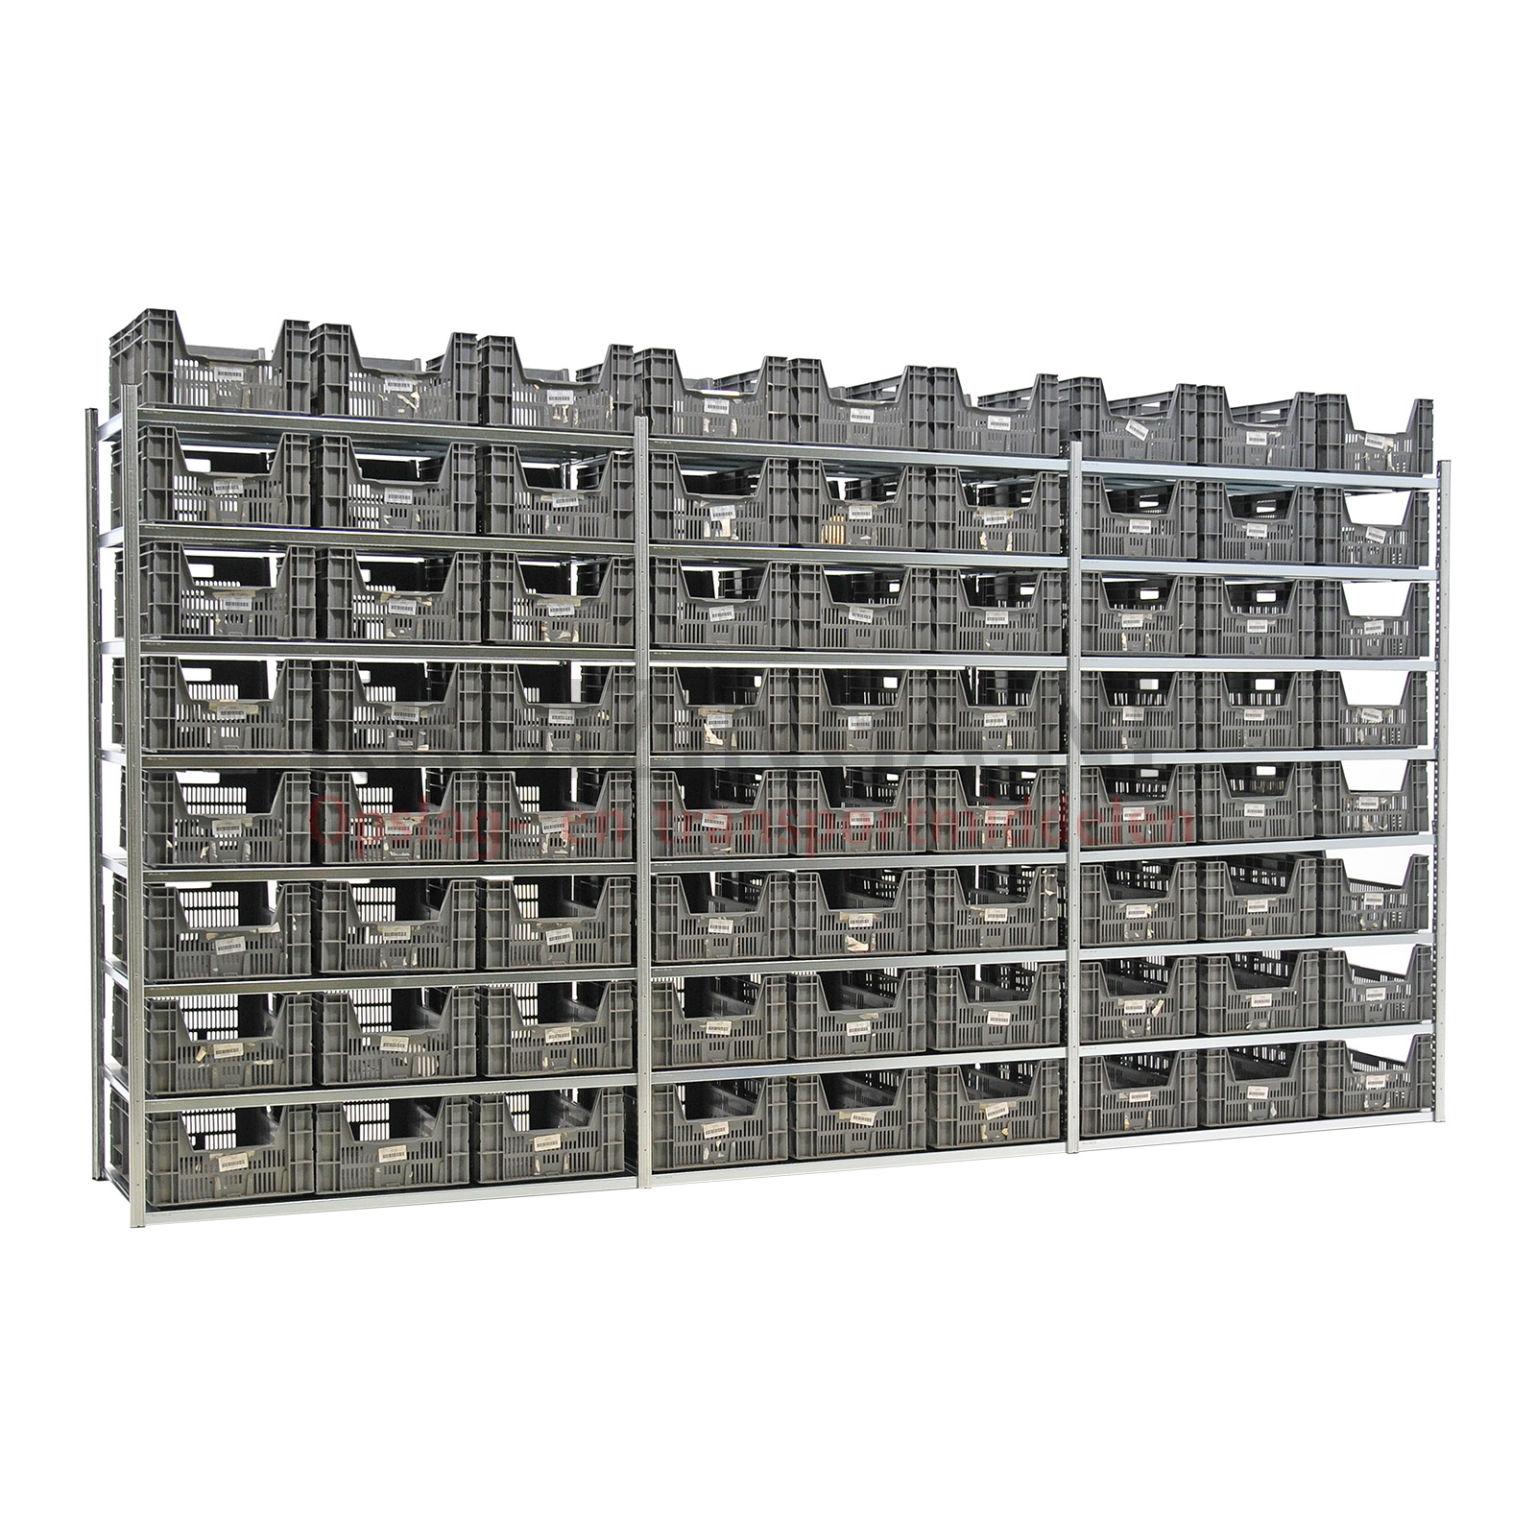 kombination satz regale kombination satz fachbodenregal inkl 72 stapelboxen gebraucht ab 740. Black Bedroom Furniture Sets. Home Design Ideas